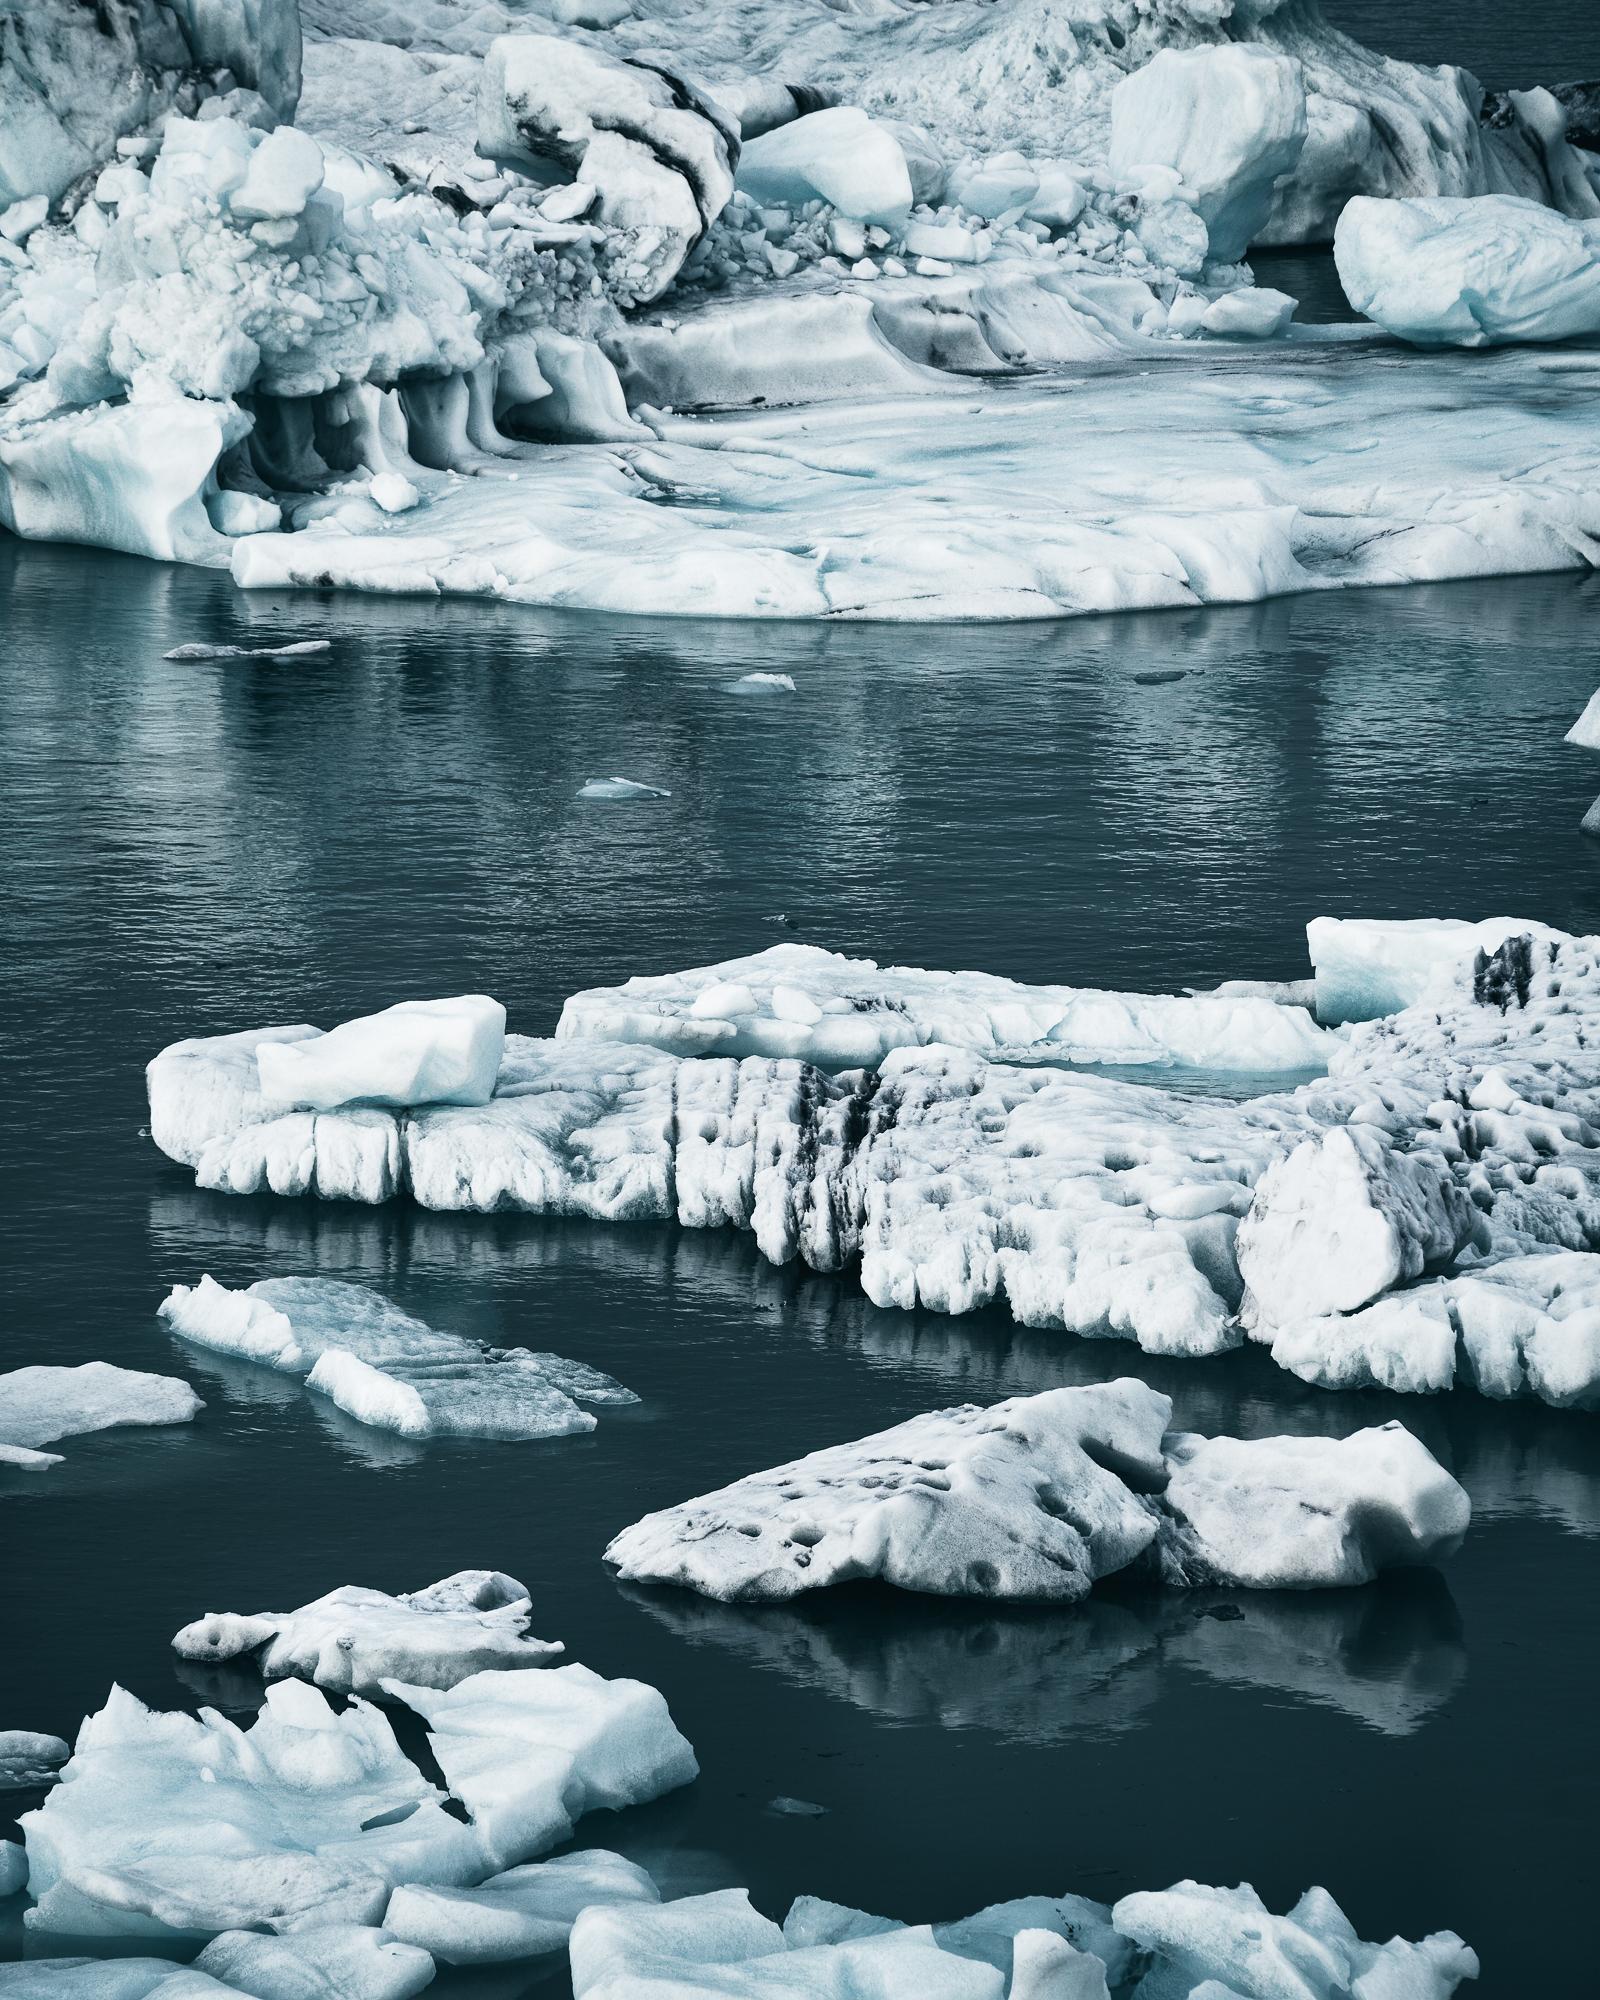 FrozenIslands_2018_0927_Island_Instagram__DSC4959-Bearbeitet.jpg